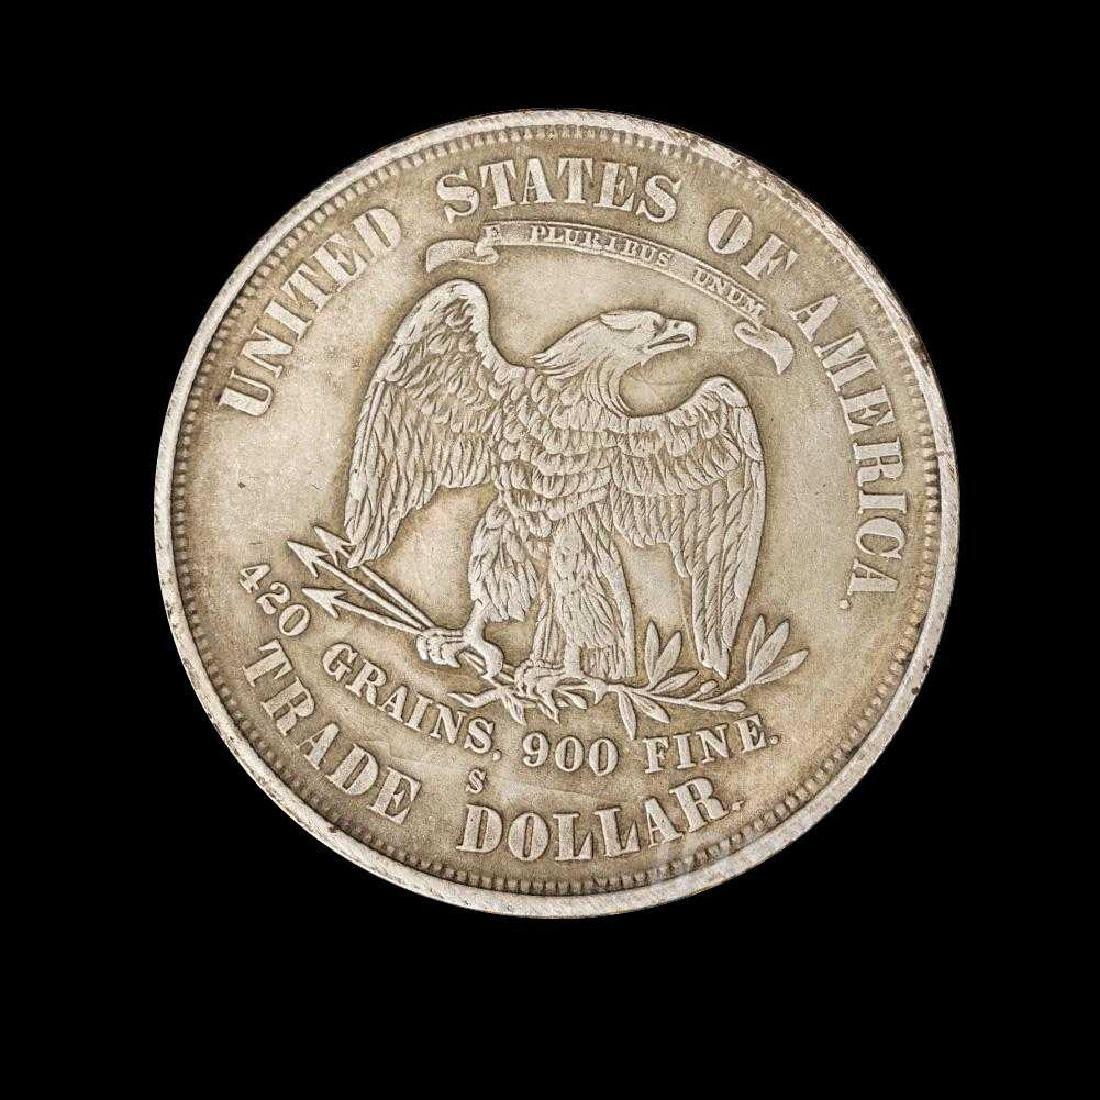 1875 United States Trade Dollar Commemorative Coin - 2